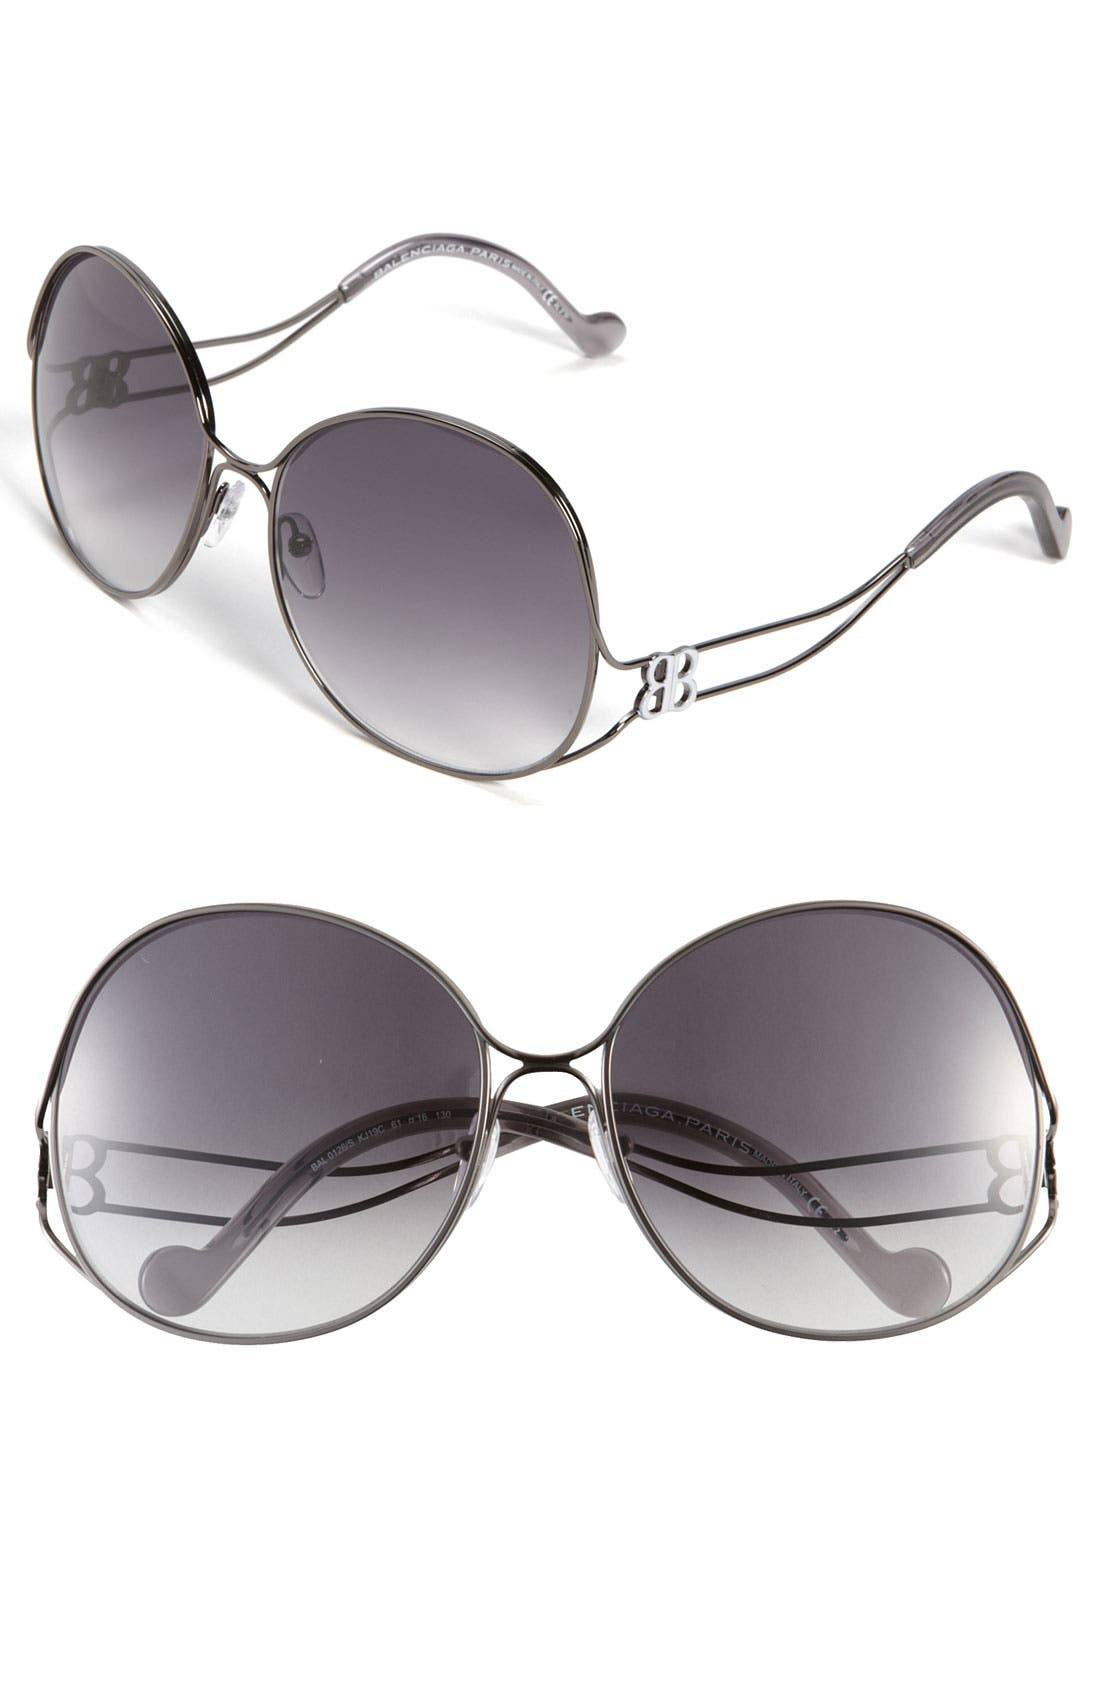 Main Image - Balenciaga Paris Oversized Sunglasses